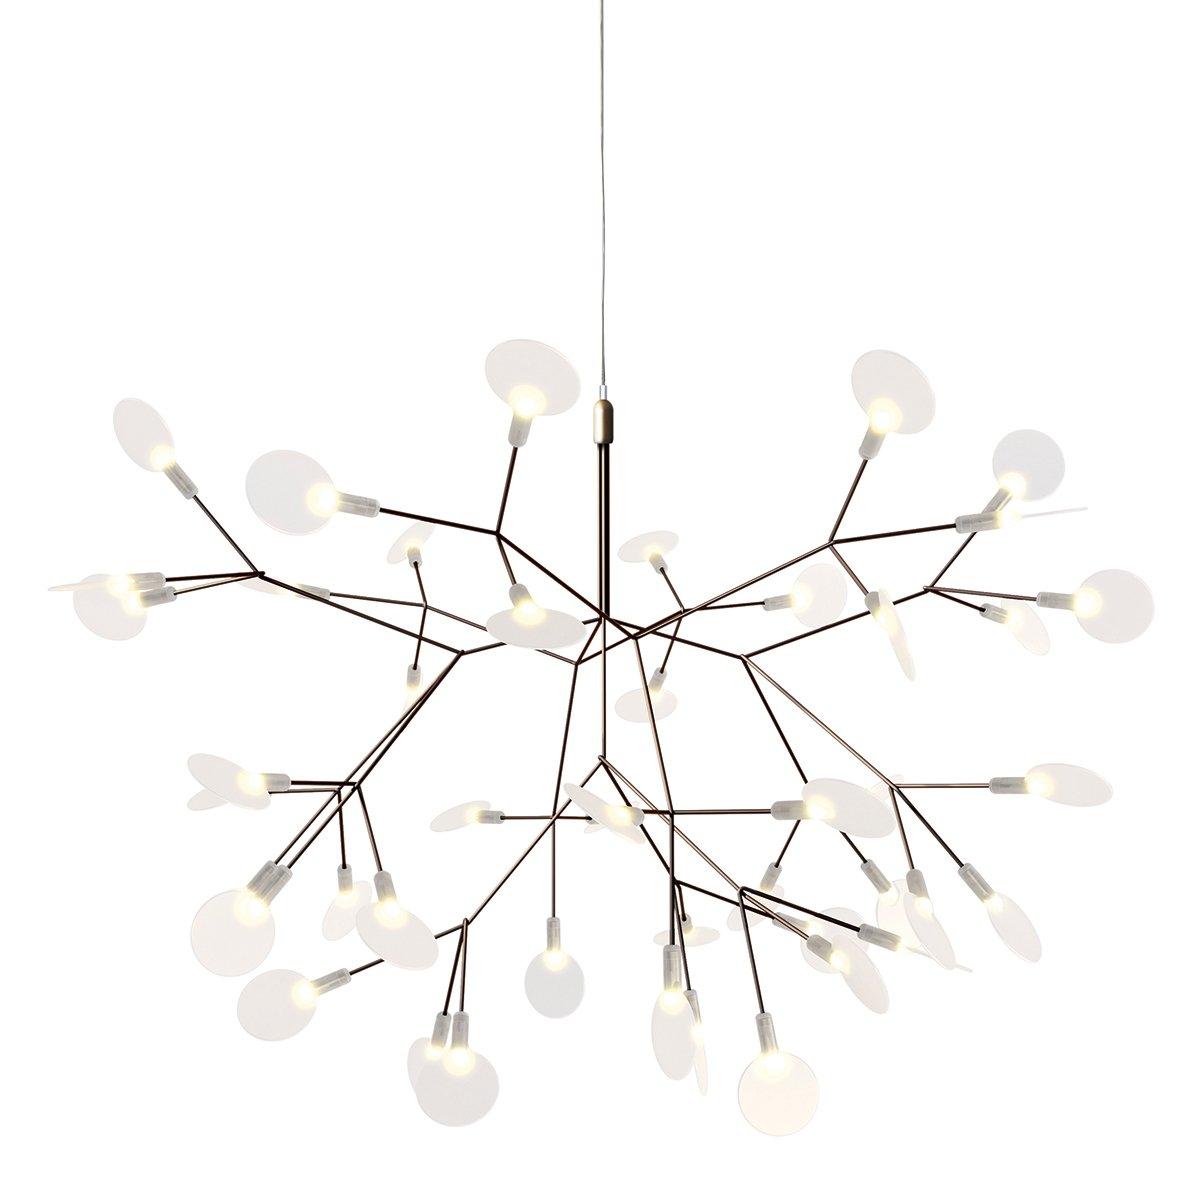 Moooi Heracleum Small Hanglamp